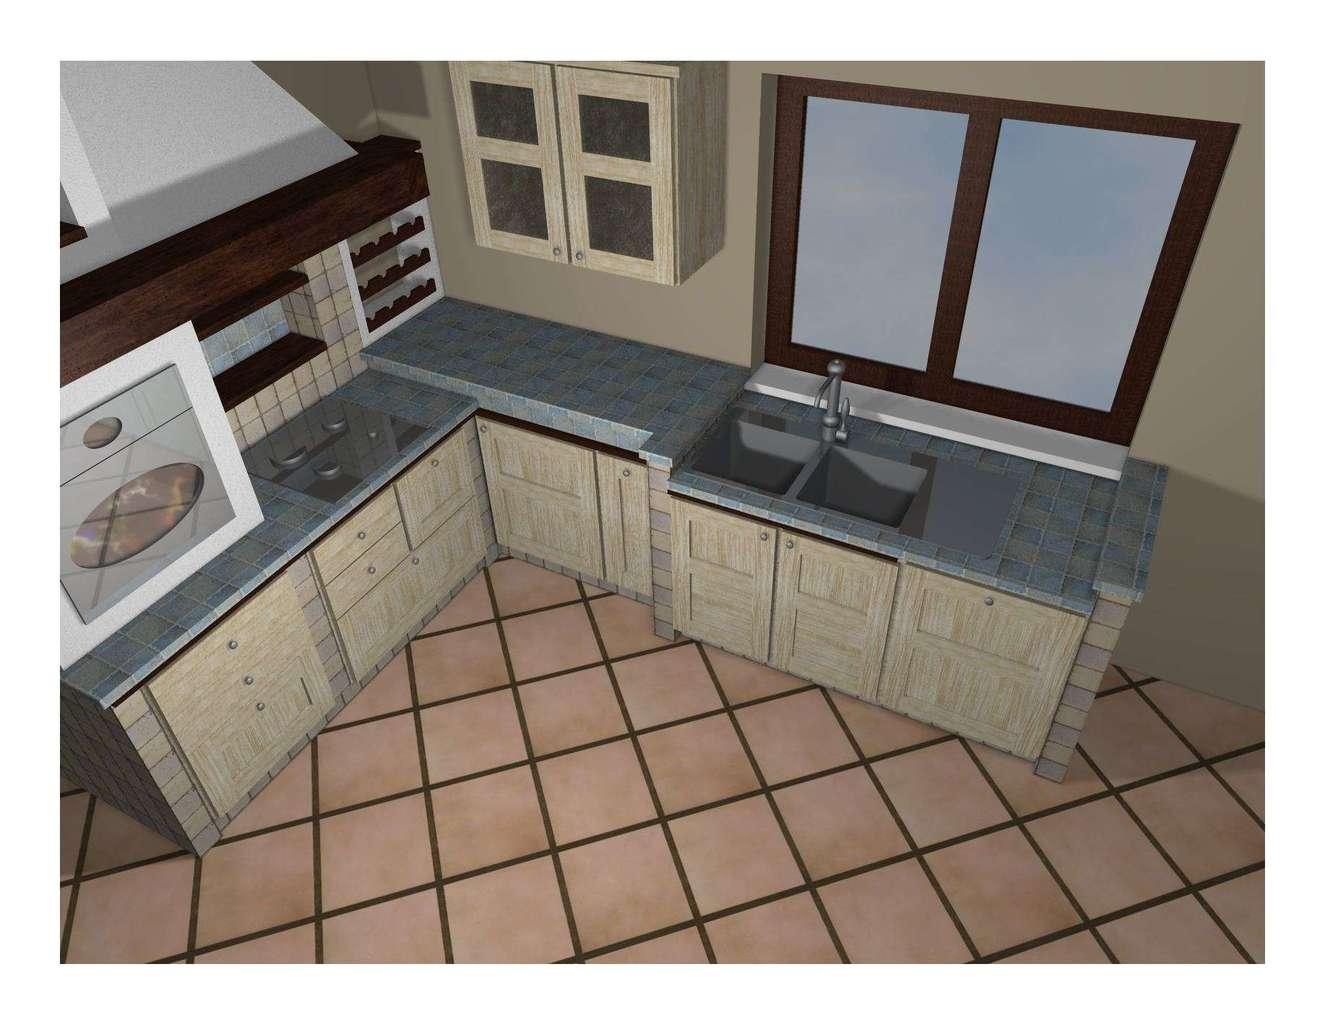 Cucina in muratura prefabbricata - Questioni di Arredamento